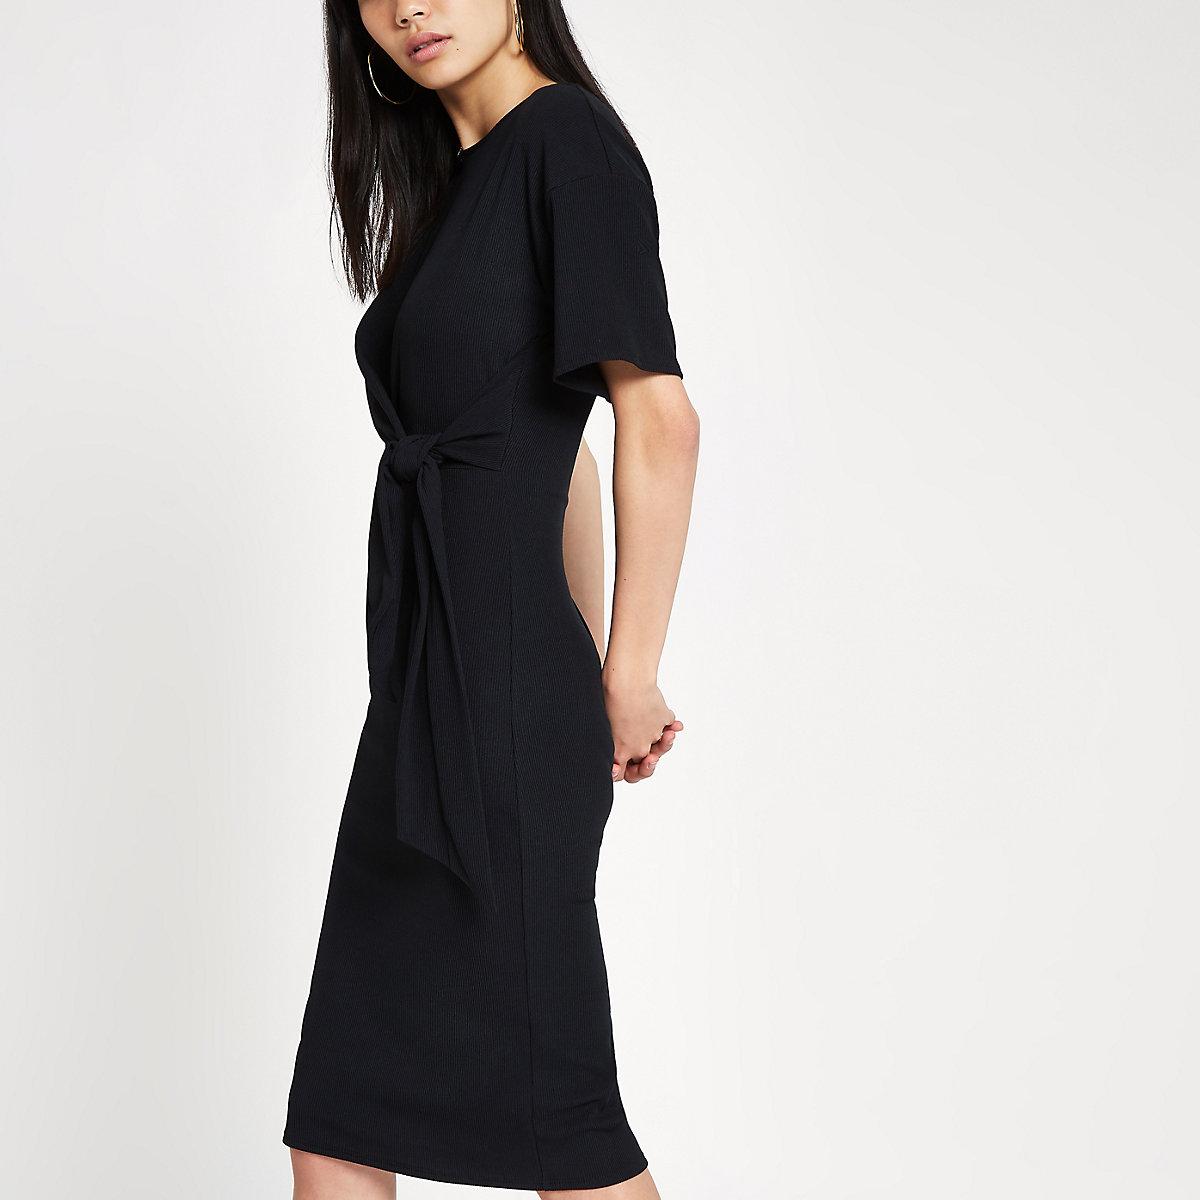 Black short sleeve tie front bodycon dress